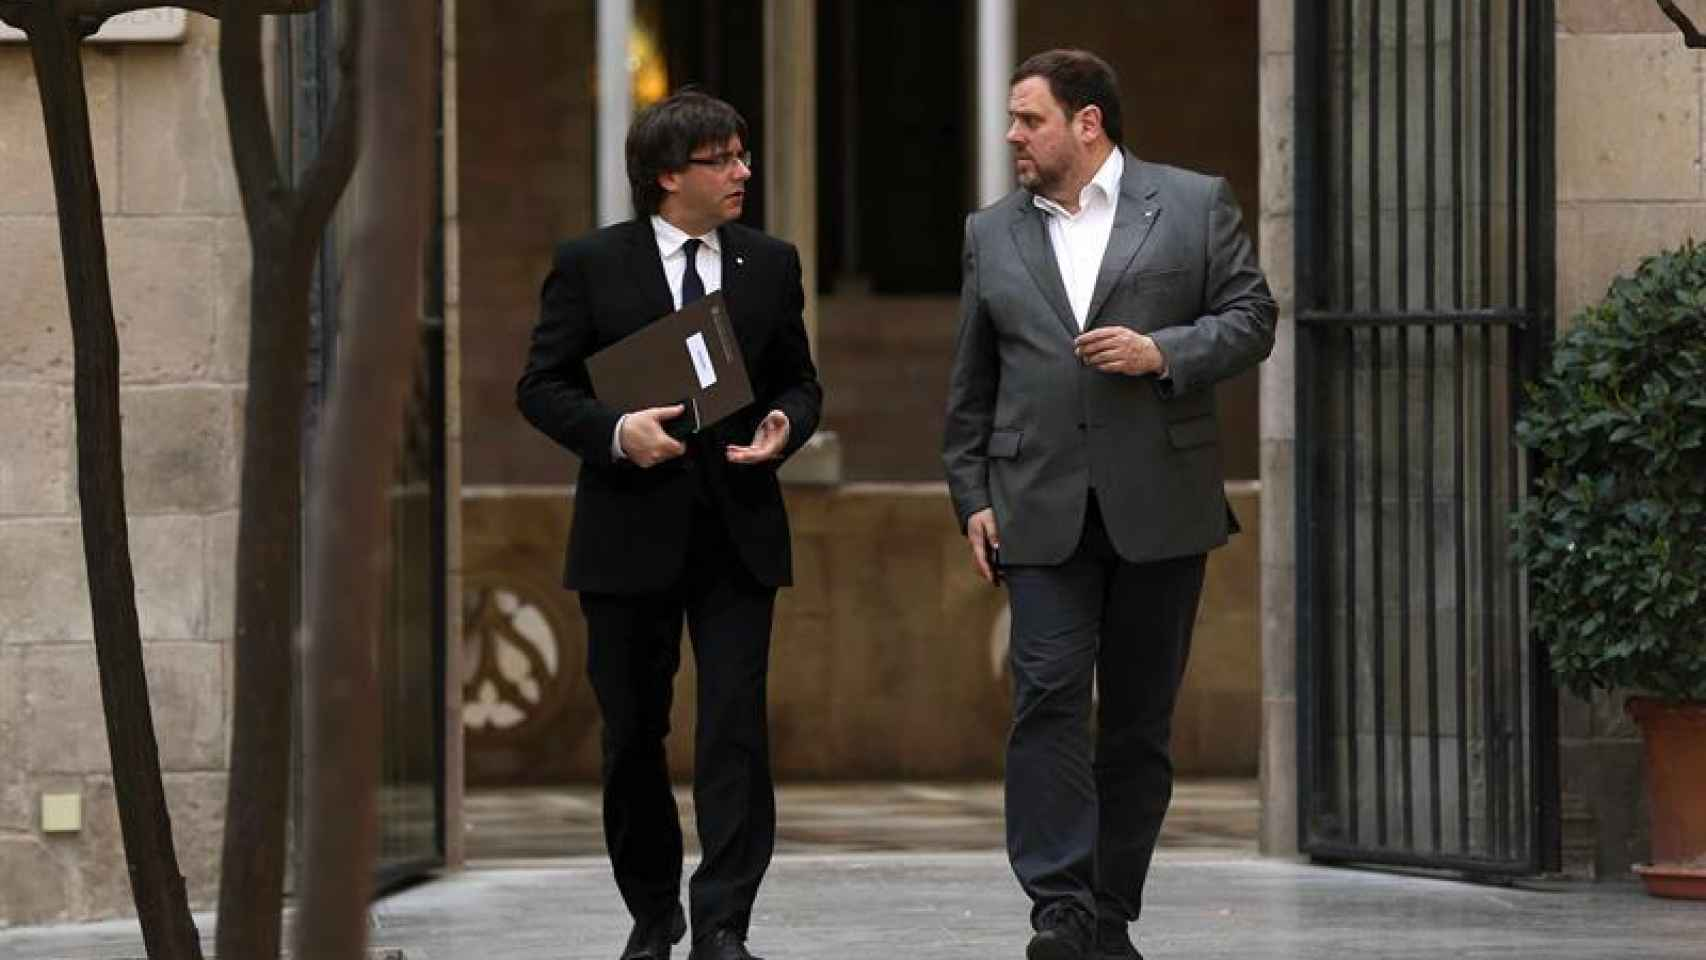 Elpresident de la Generalitat, Carles Puigdemont, junto al vicepresidente, Oriol Junqueras